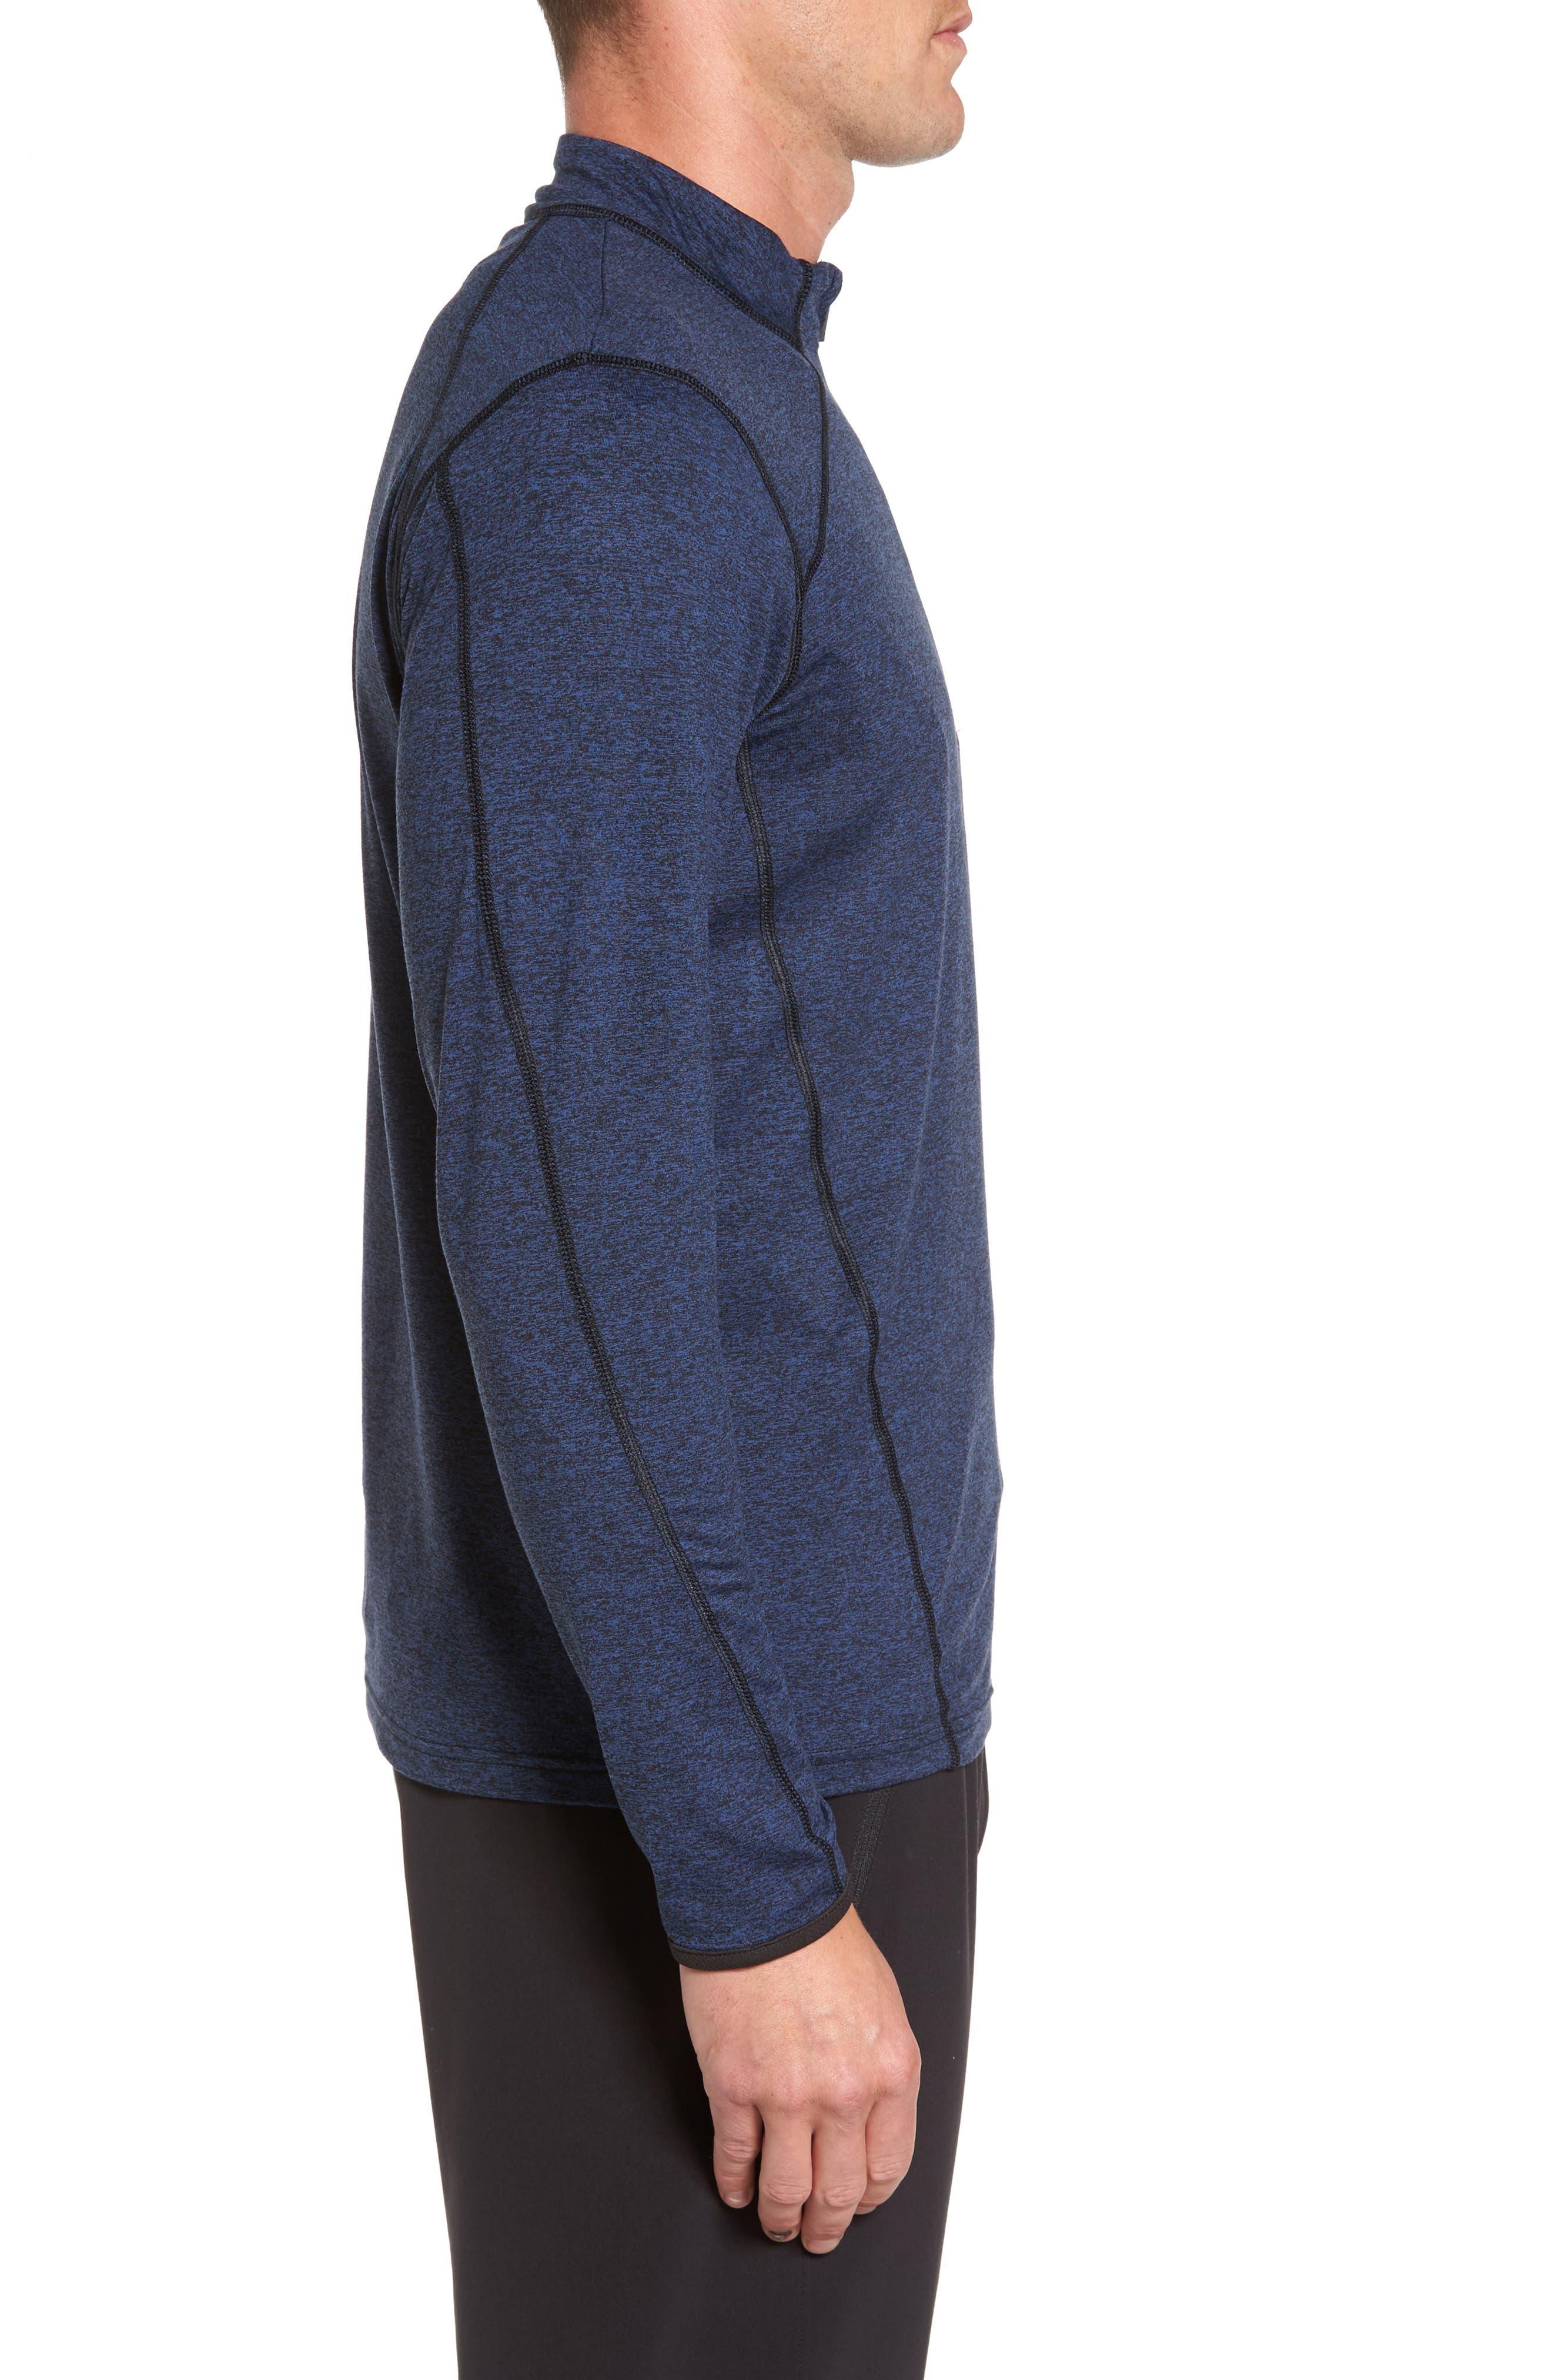 'Elevate' Moisture Wicking Stretch Quarter Zip Pullover,                             Alternate thumbnail 3, color,                             Navy Black/ Black/ White